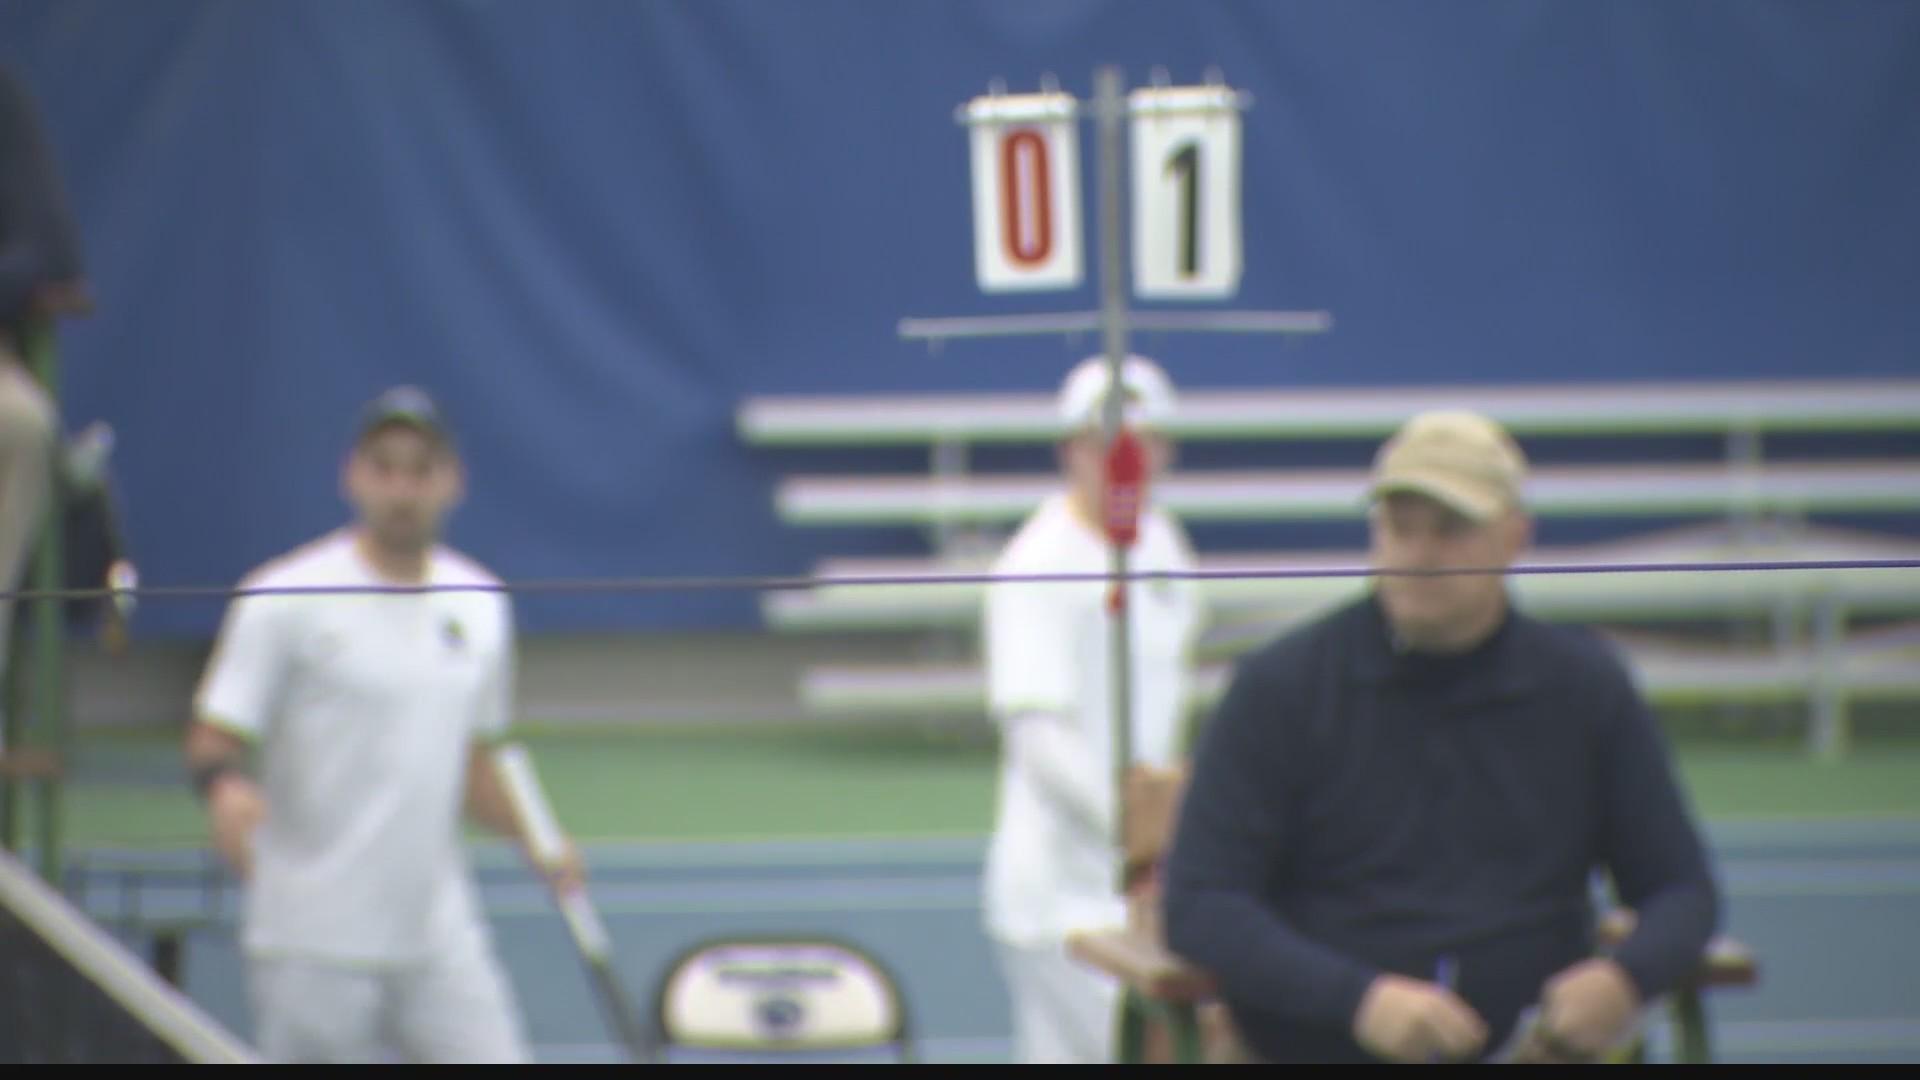 Penn_State_women_s_tennis_coach_is_movin_0_20190513234159